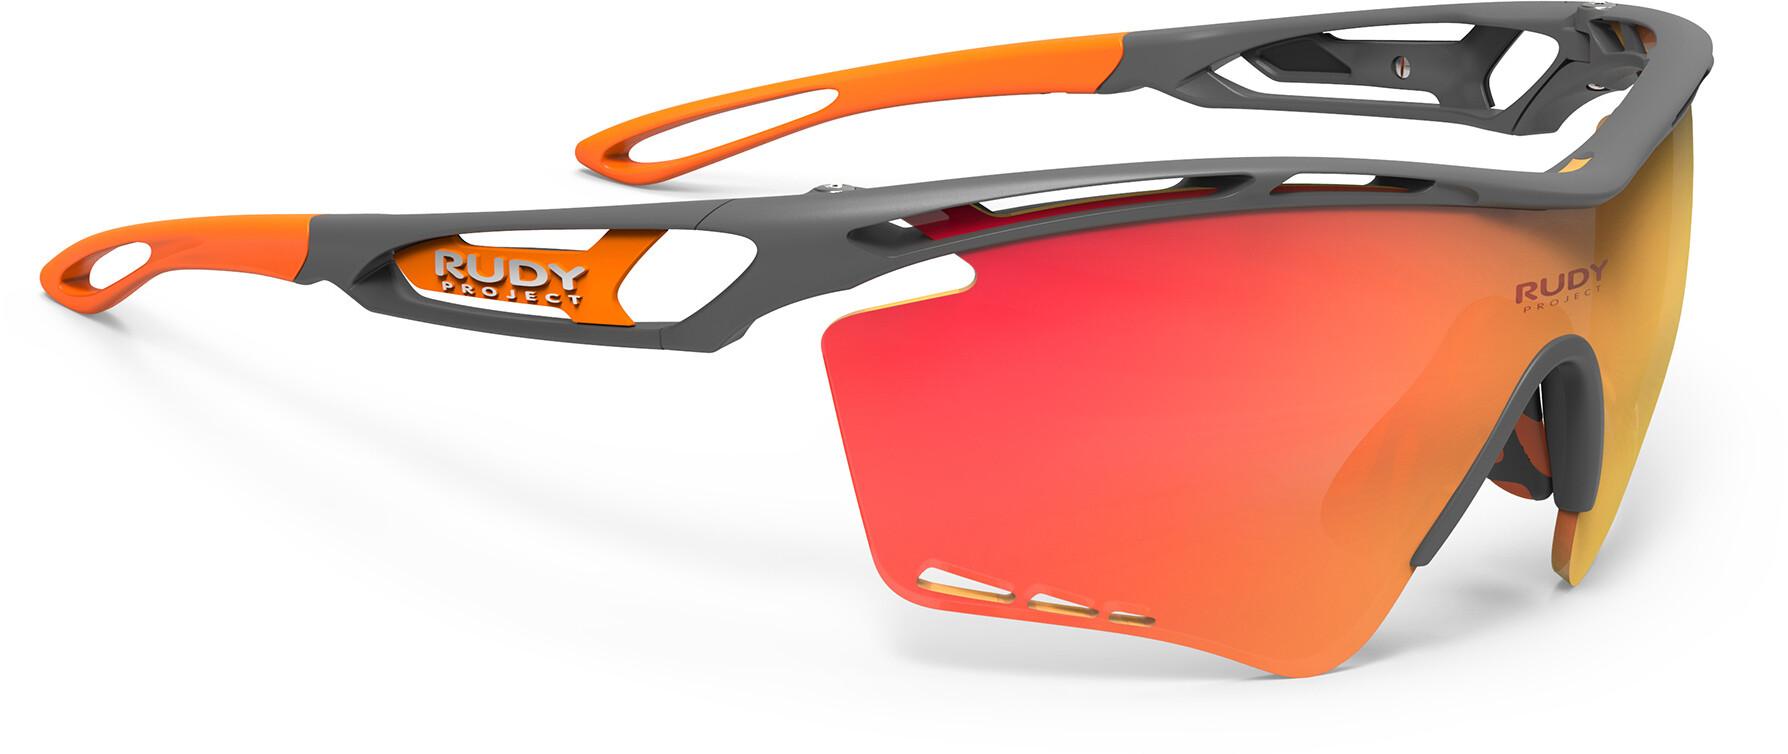 Rudy Project Tralyx XL Cykelbriller, pyombo matte - rp optics multilaser orange (2020) | Glasses